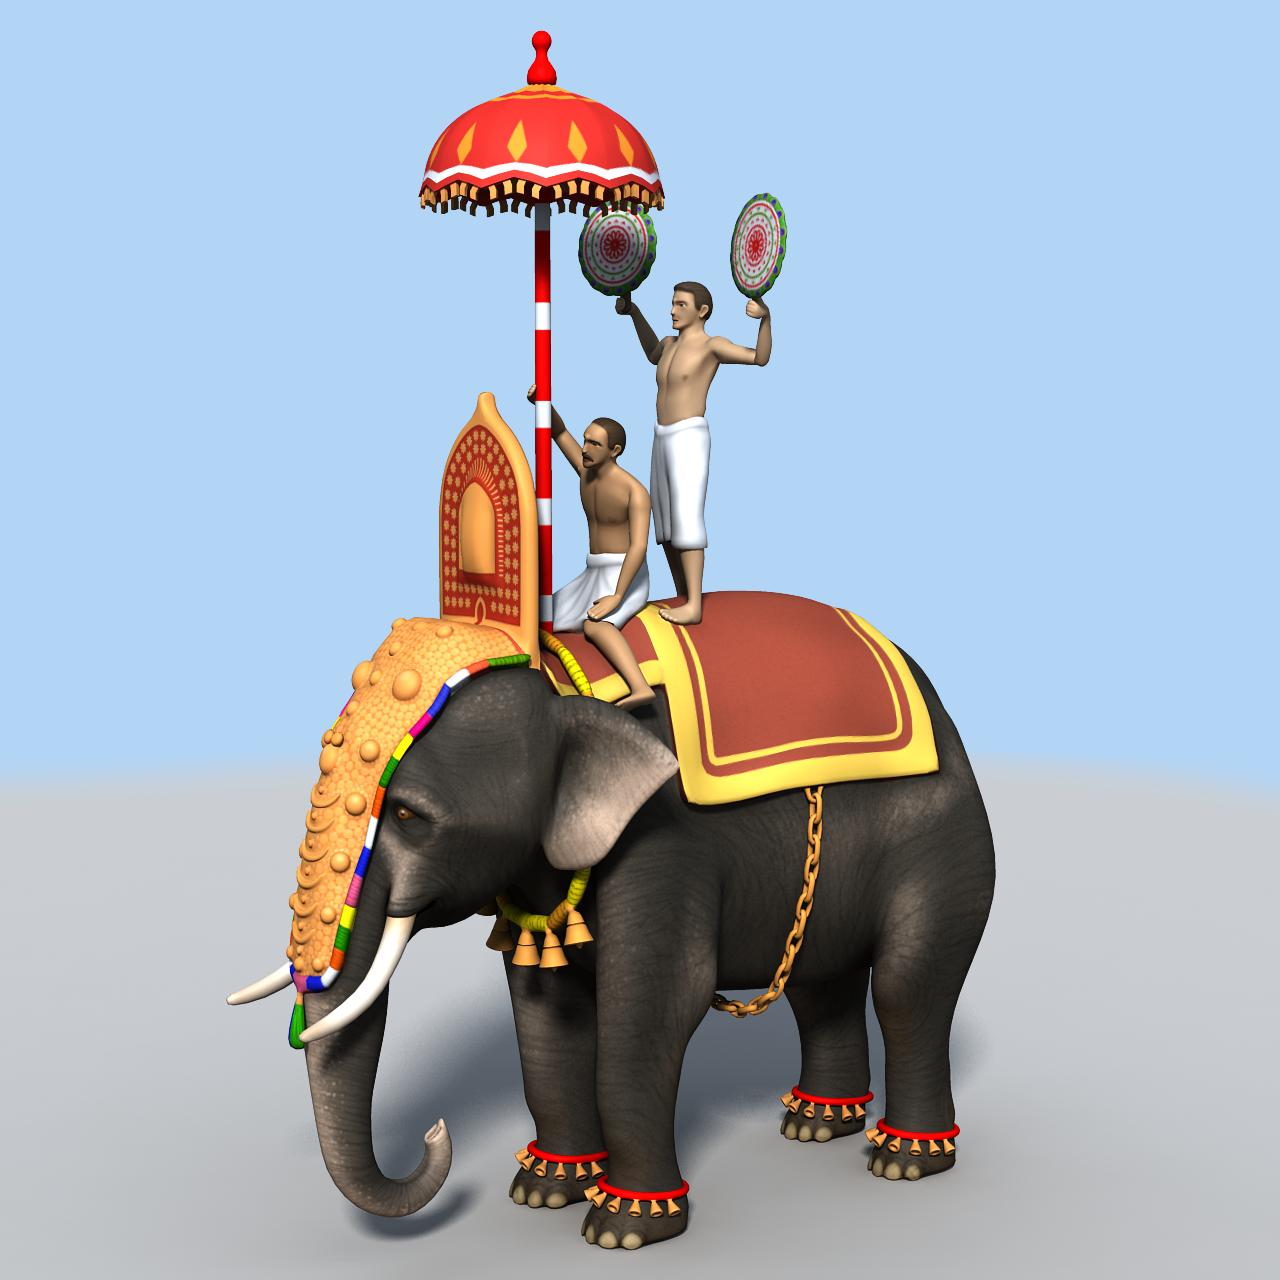 Caparisoned Kerala Elephant 3d Model And Texture On Behance The festivals form part of each temple's annual rituals. caparisoned kerala elephant 3d model